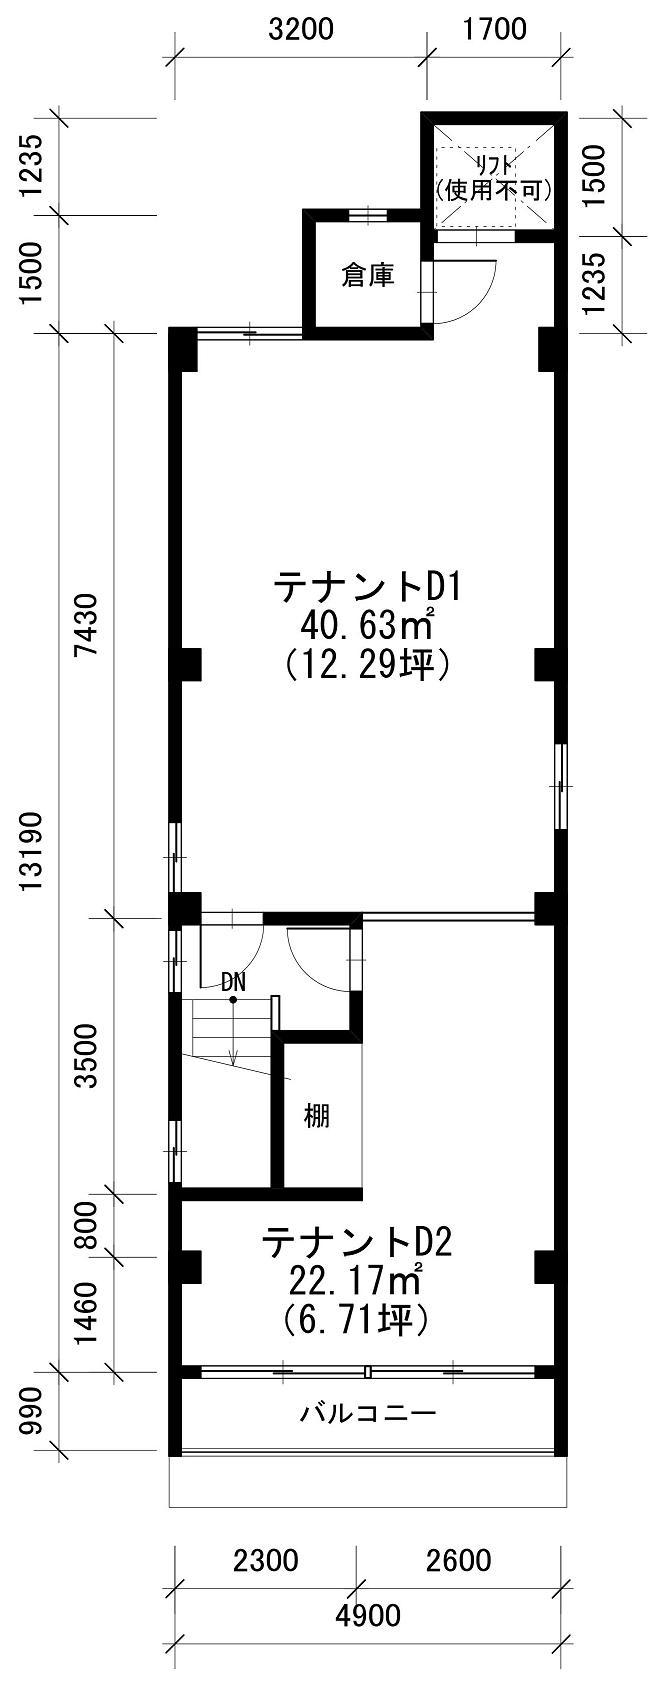 The Office葵 4階平面図161121(HP用)